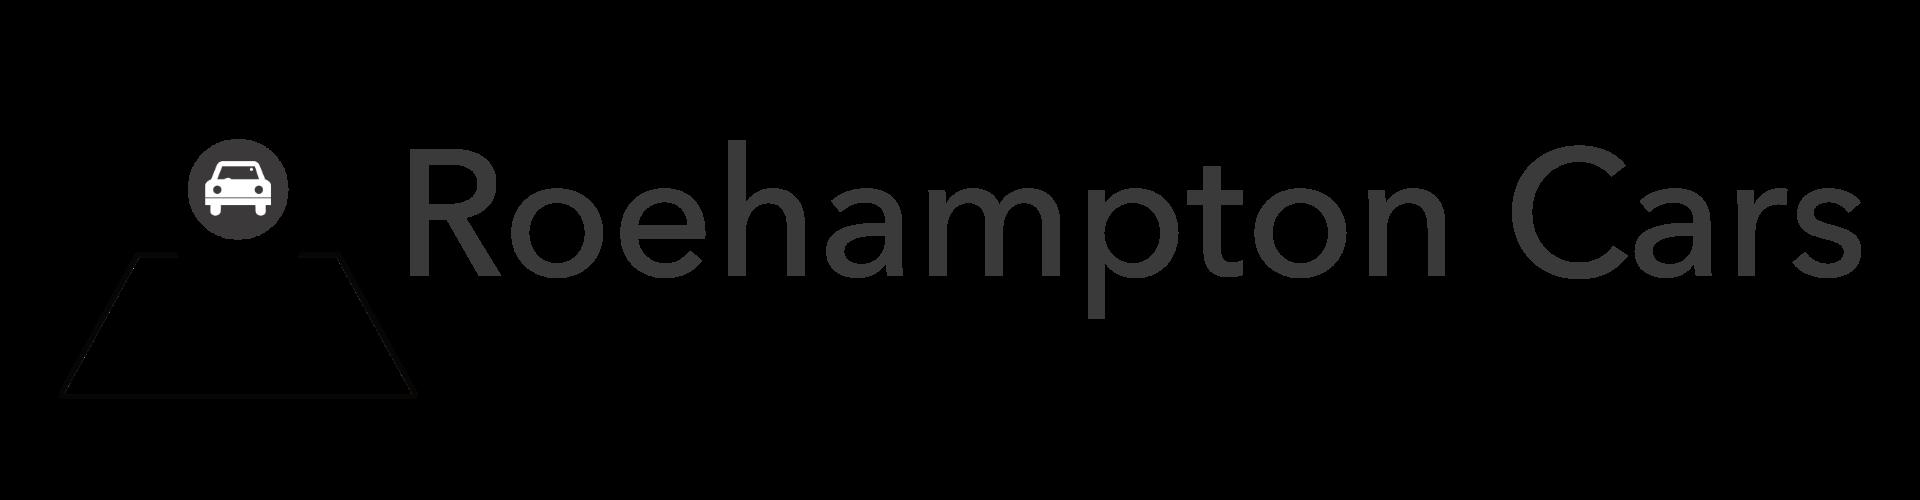 Roehampton Cars